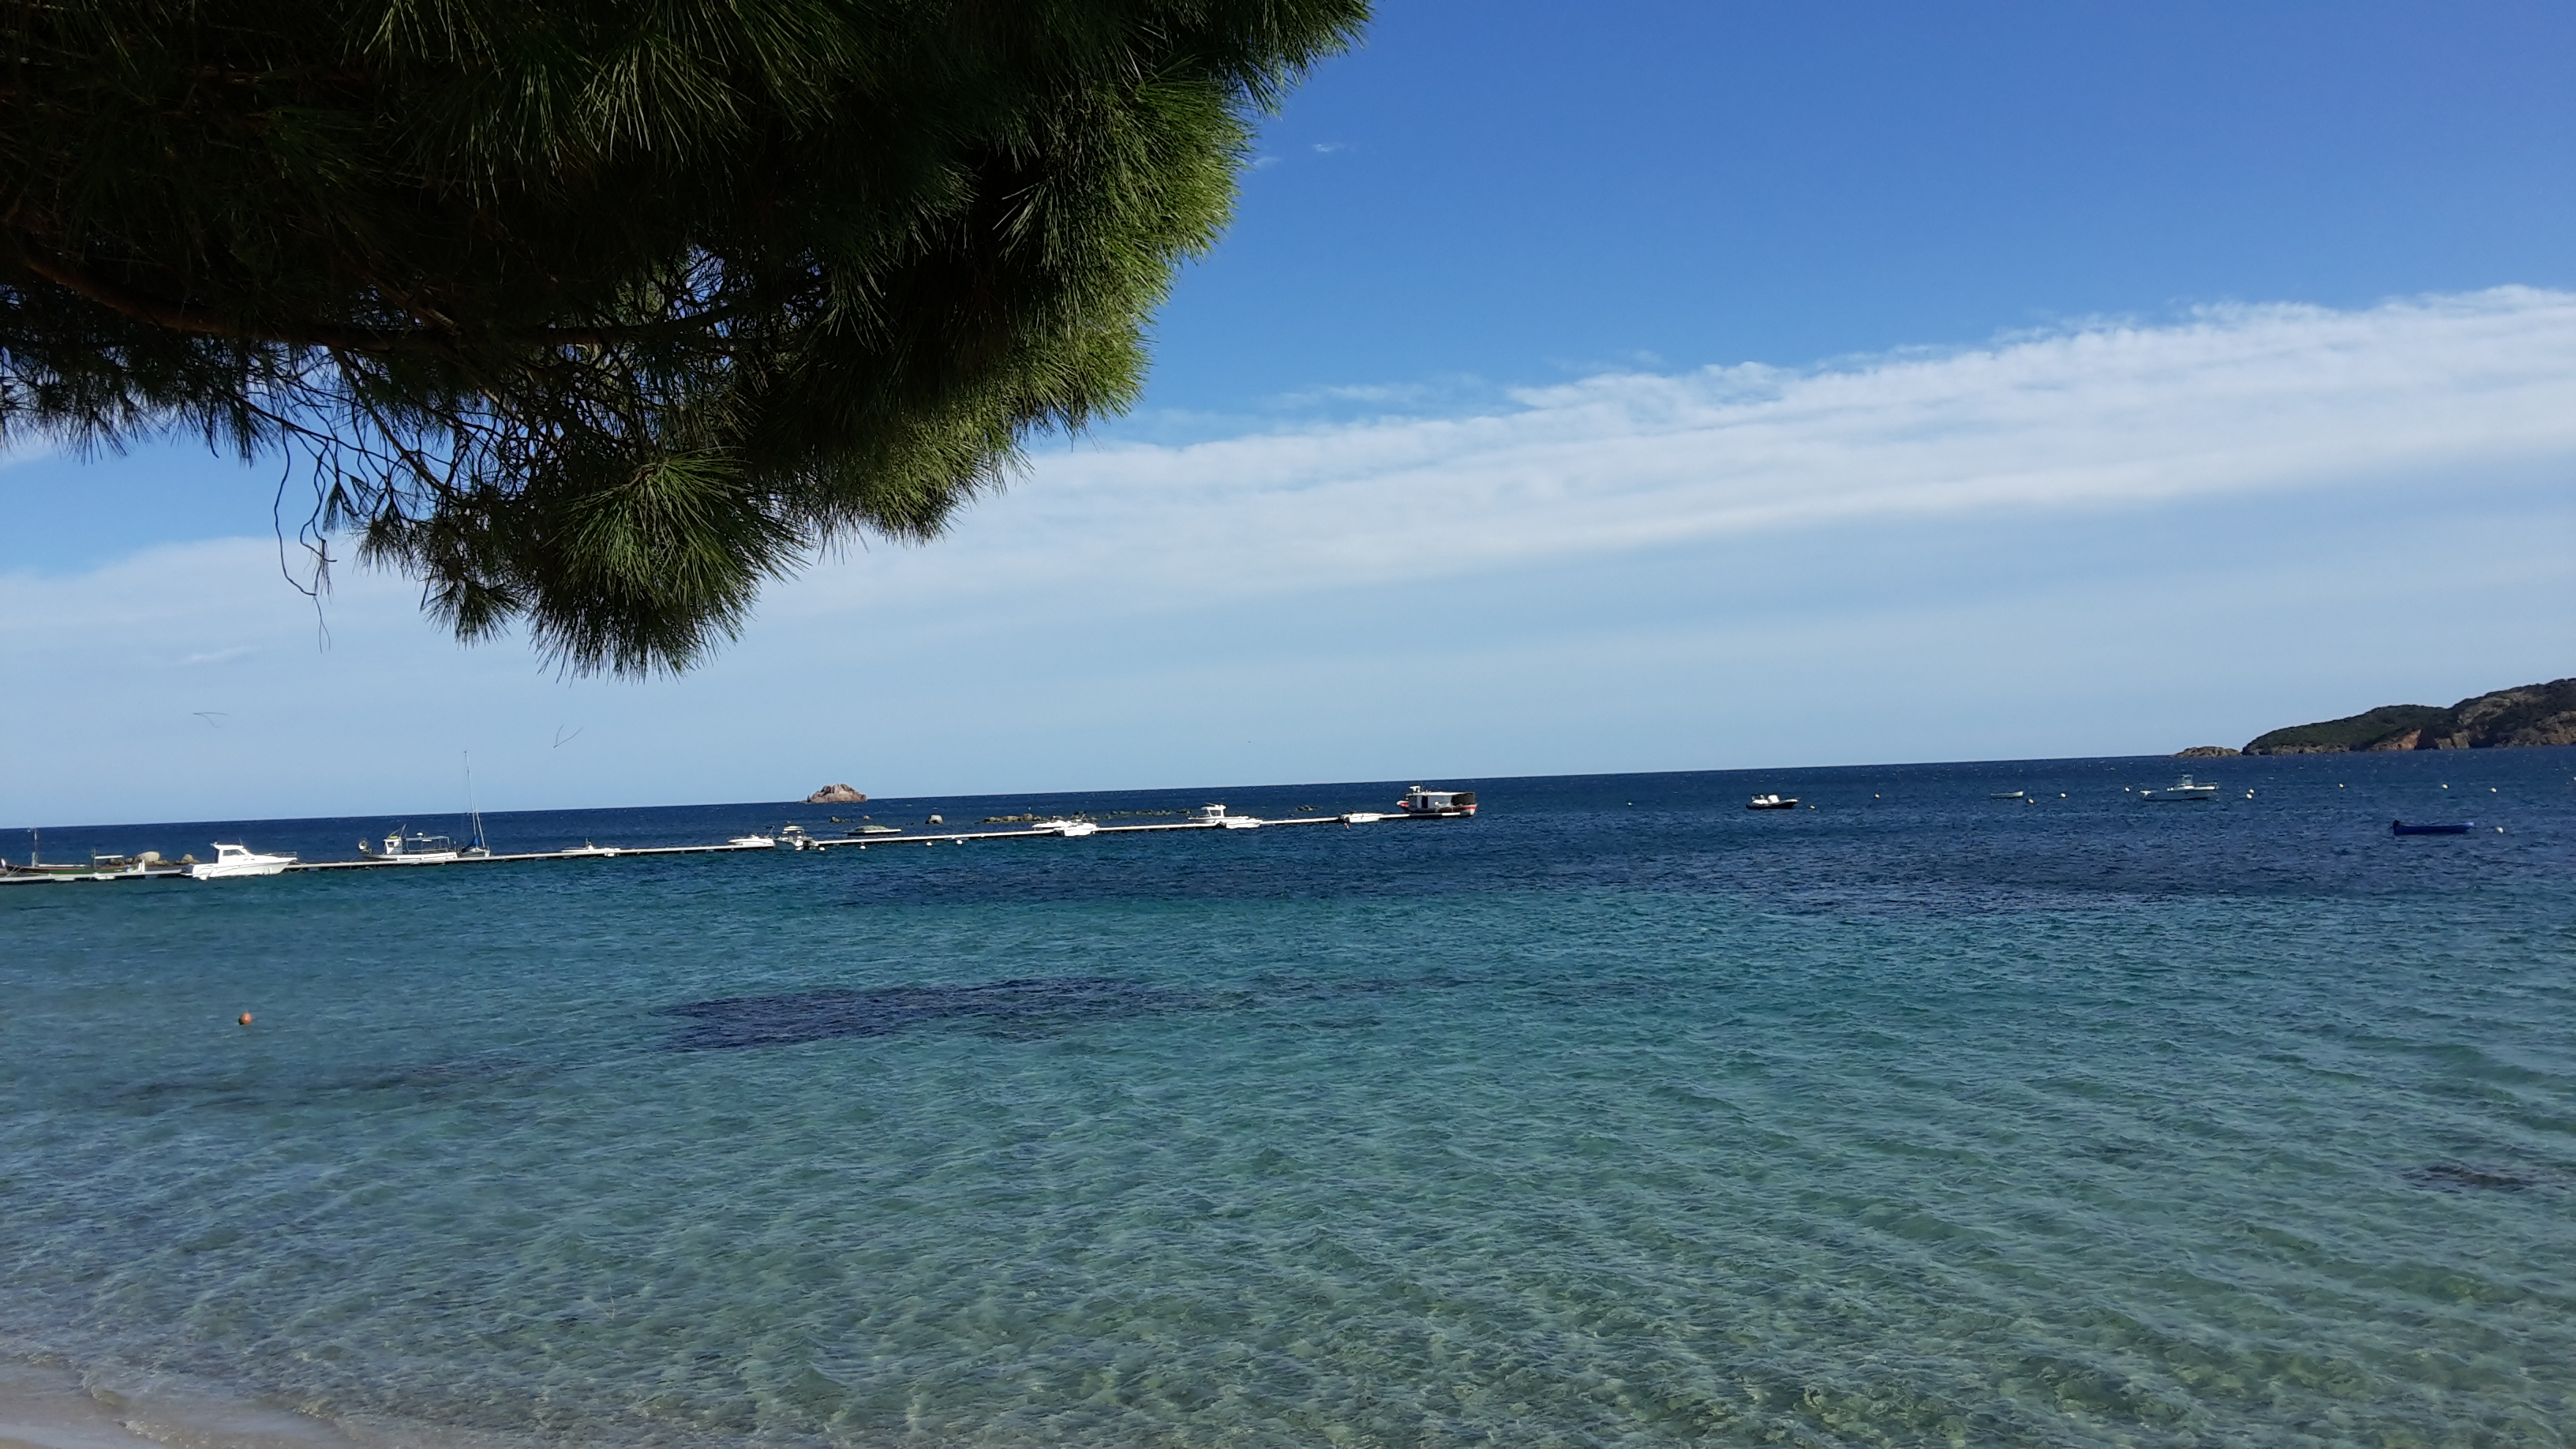 Fewo Süd Korsika, strandnah